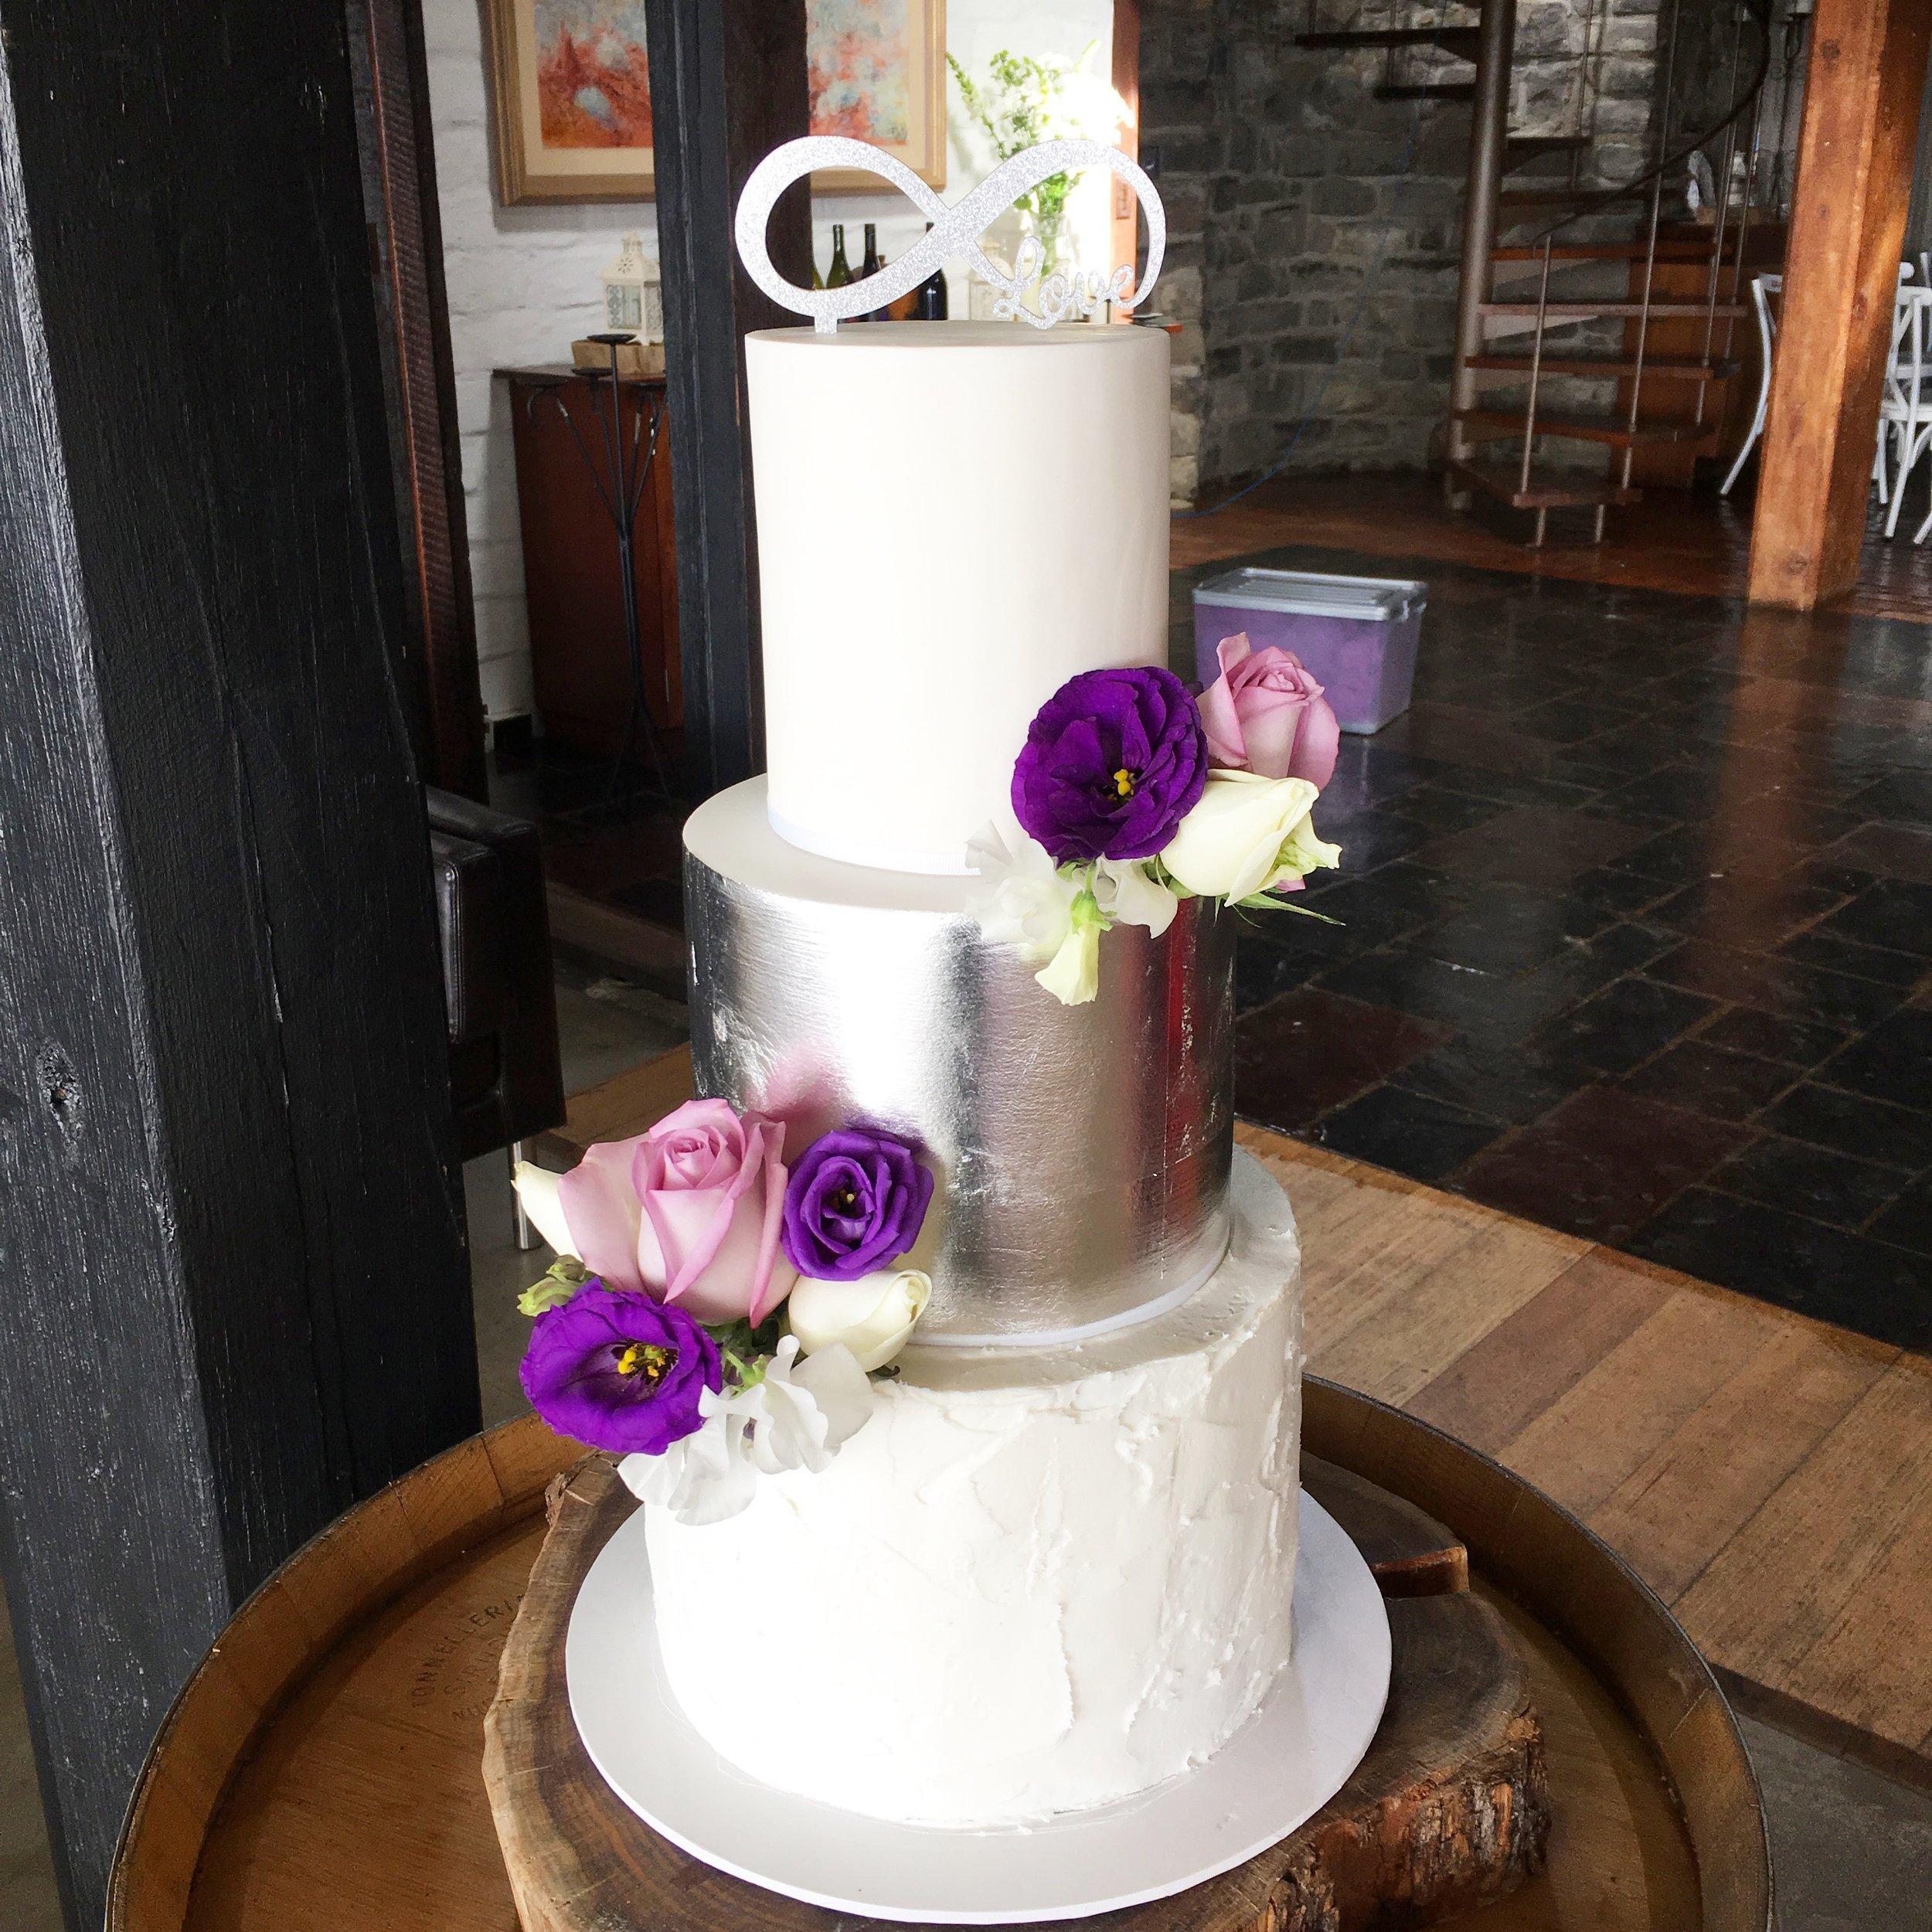 Buttercream & Silver Leaf Wedding Cake with Fresh Flowers